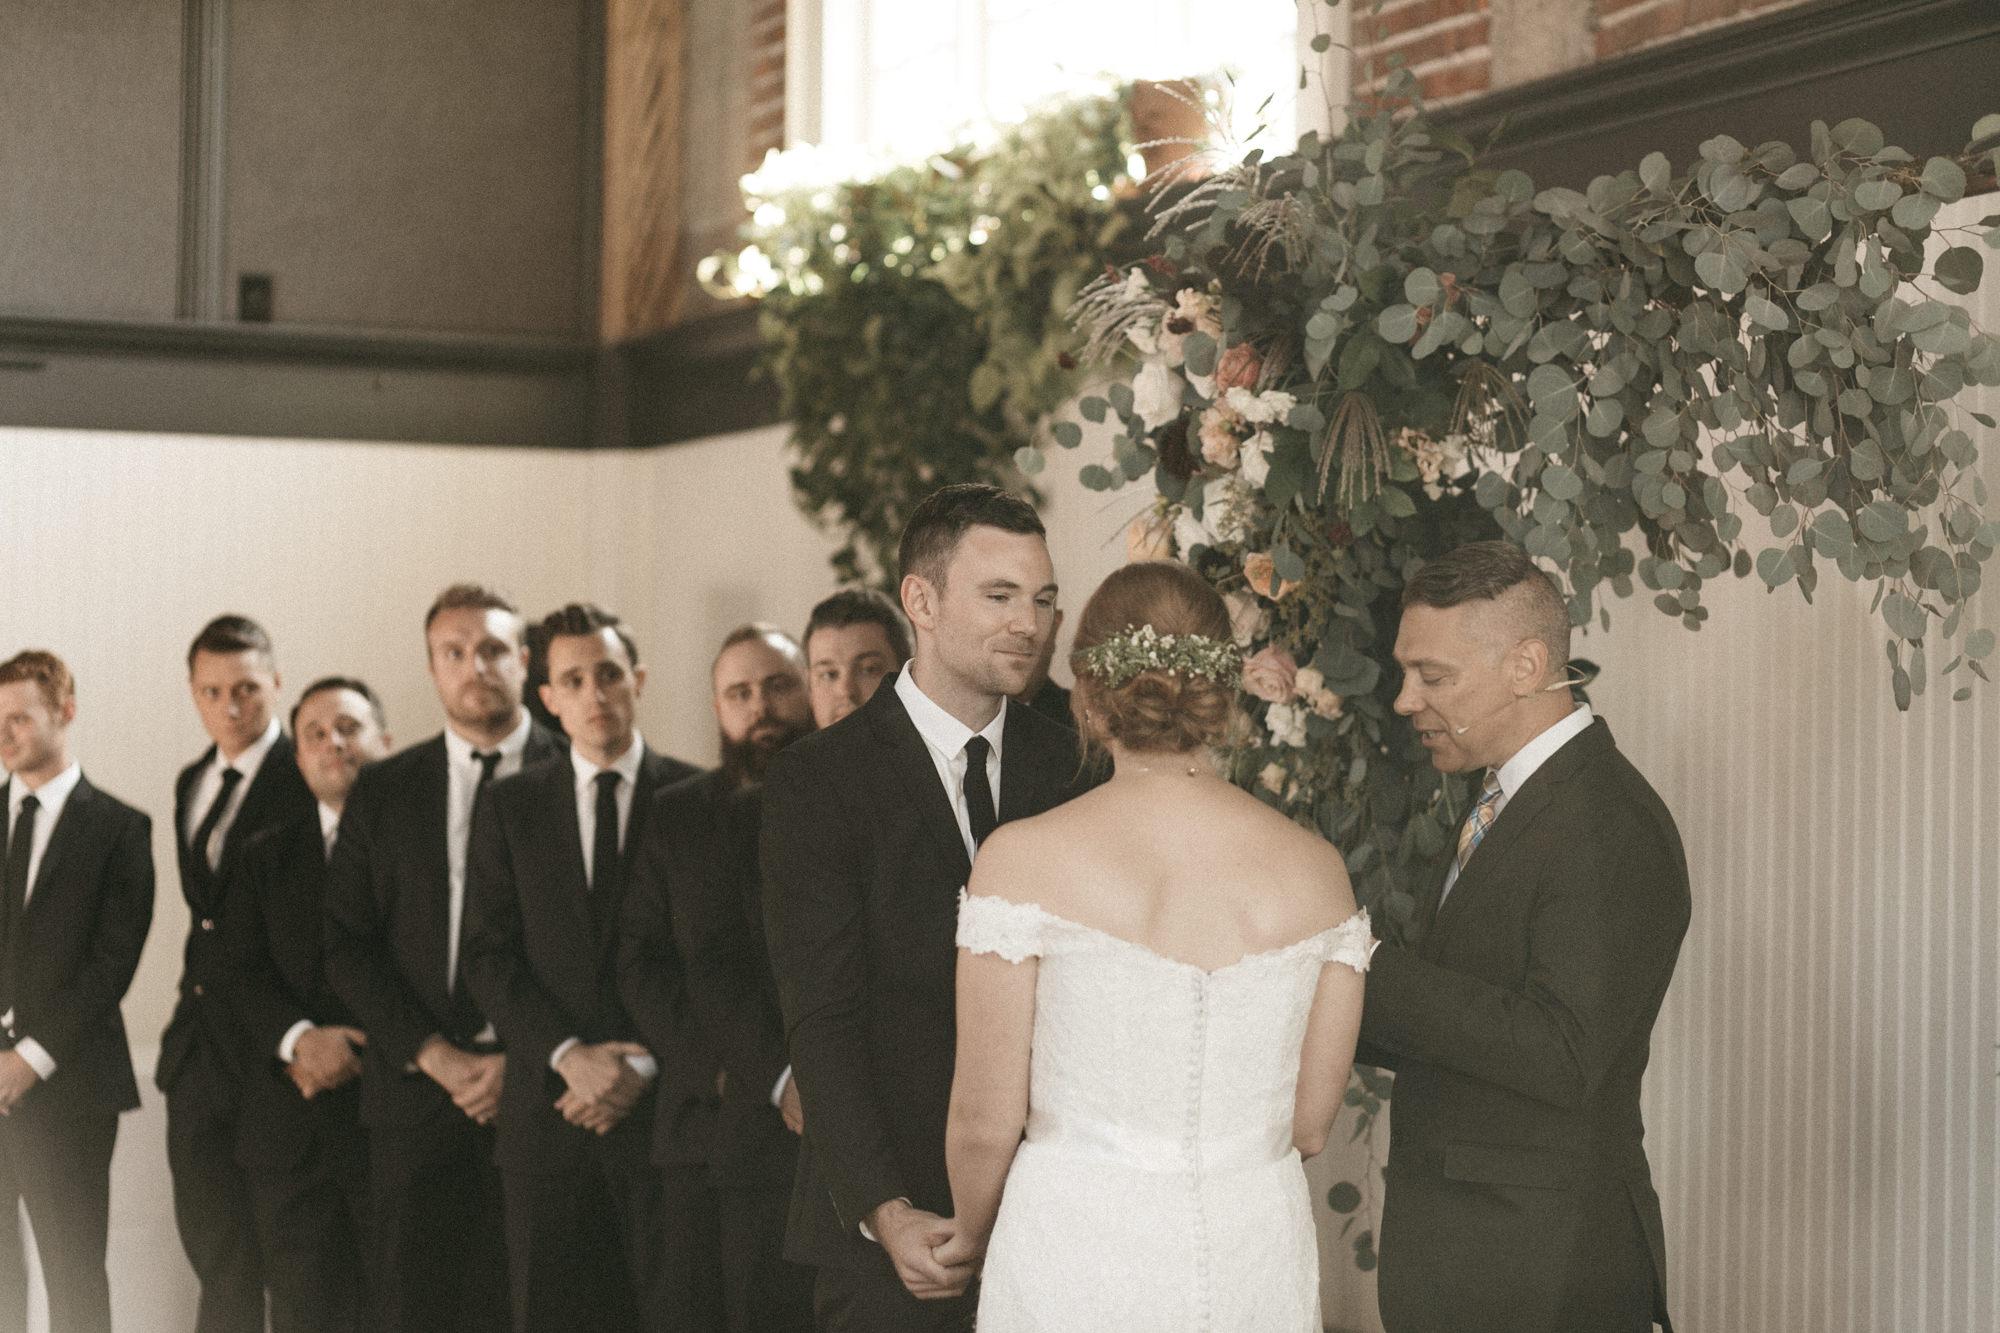 the_evergreen_portland_wedding-67.jpg